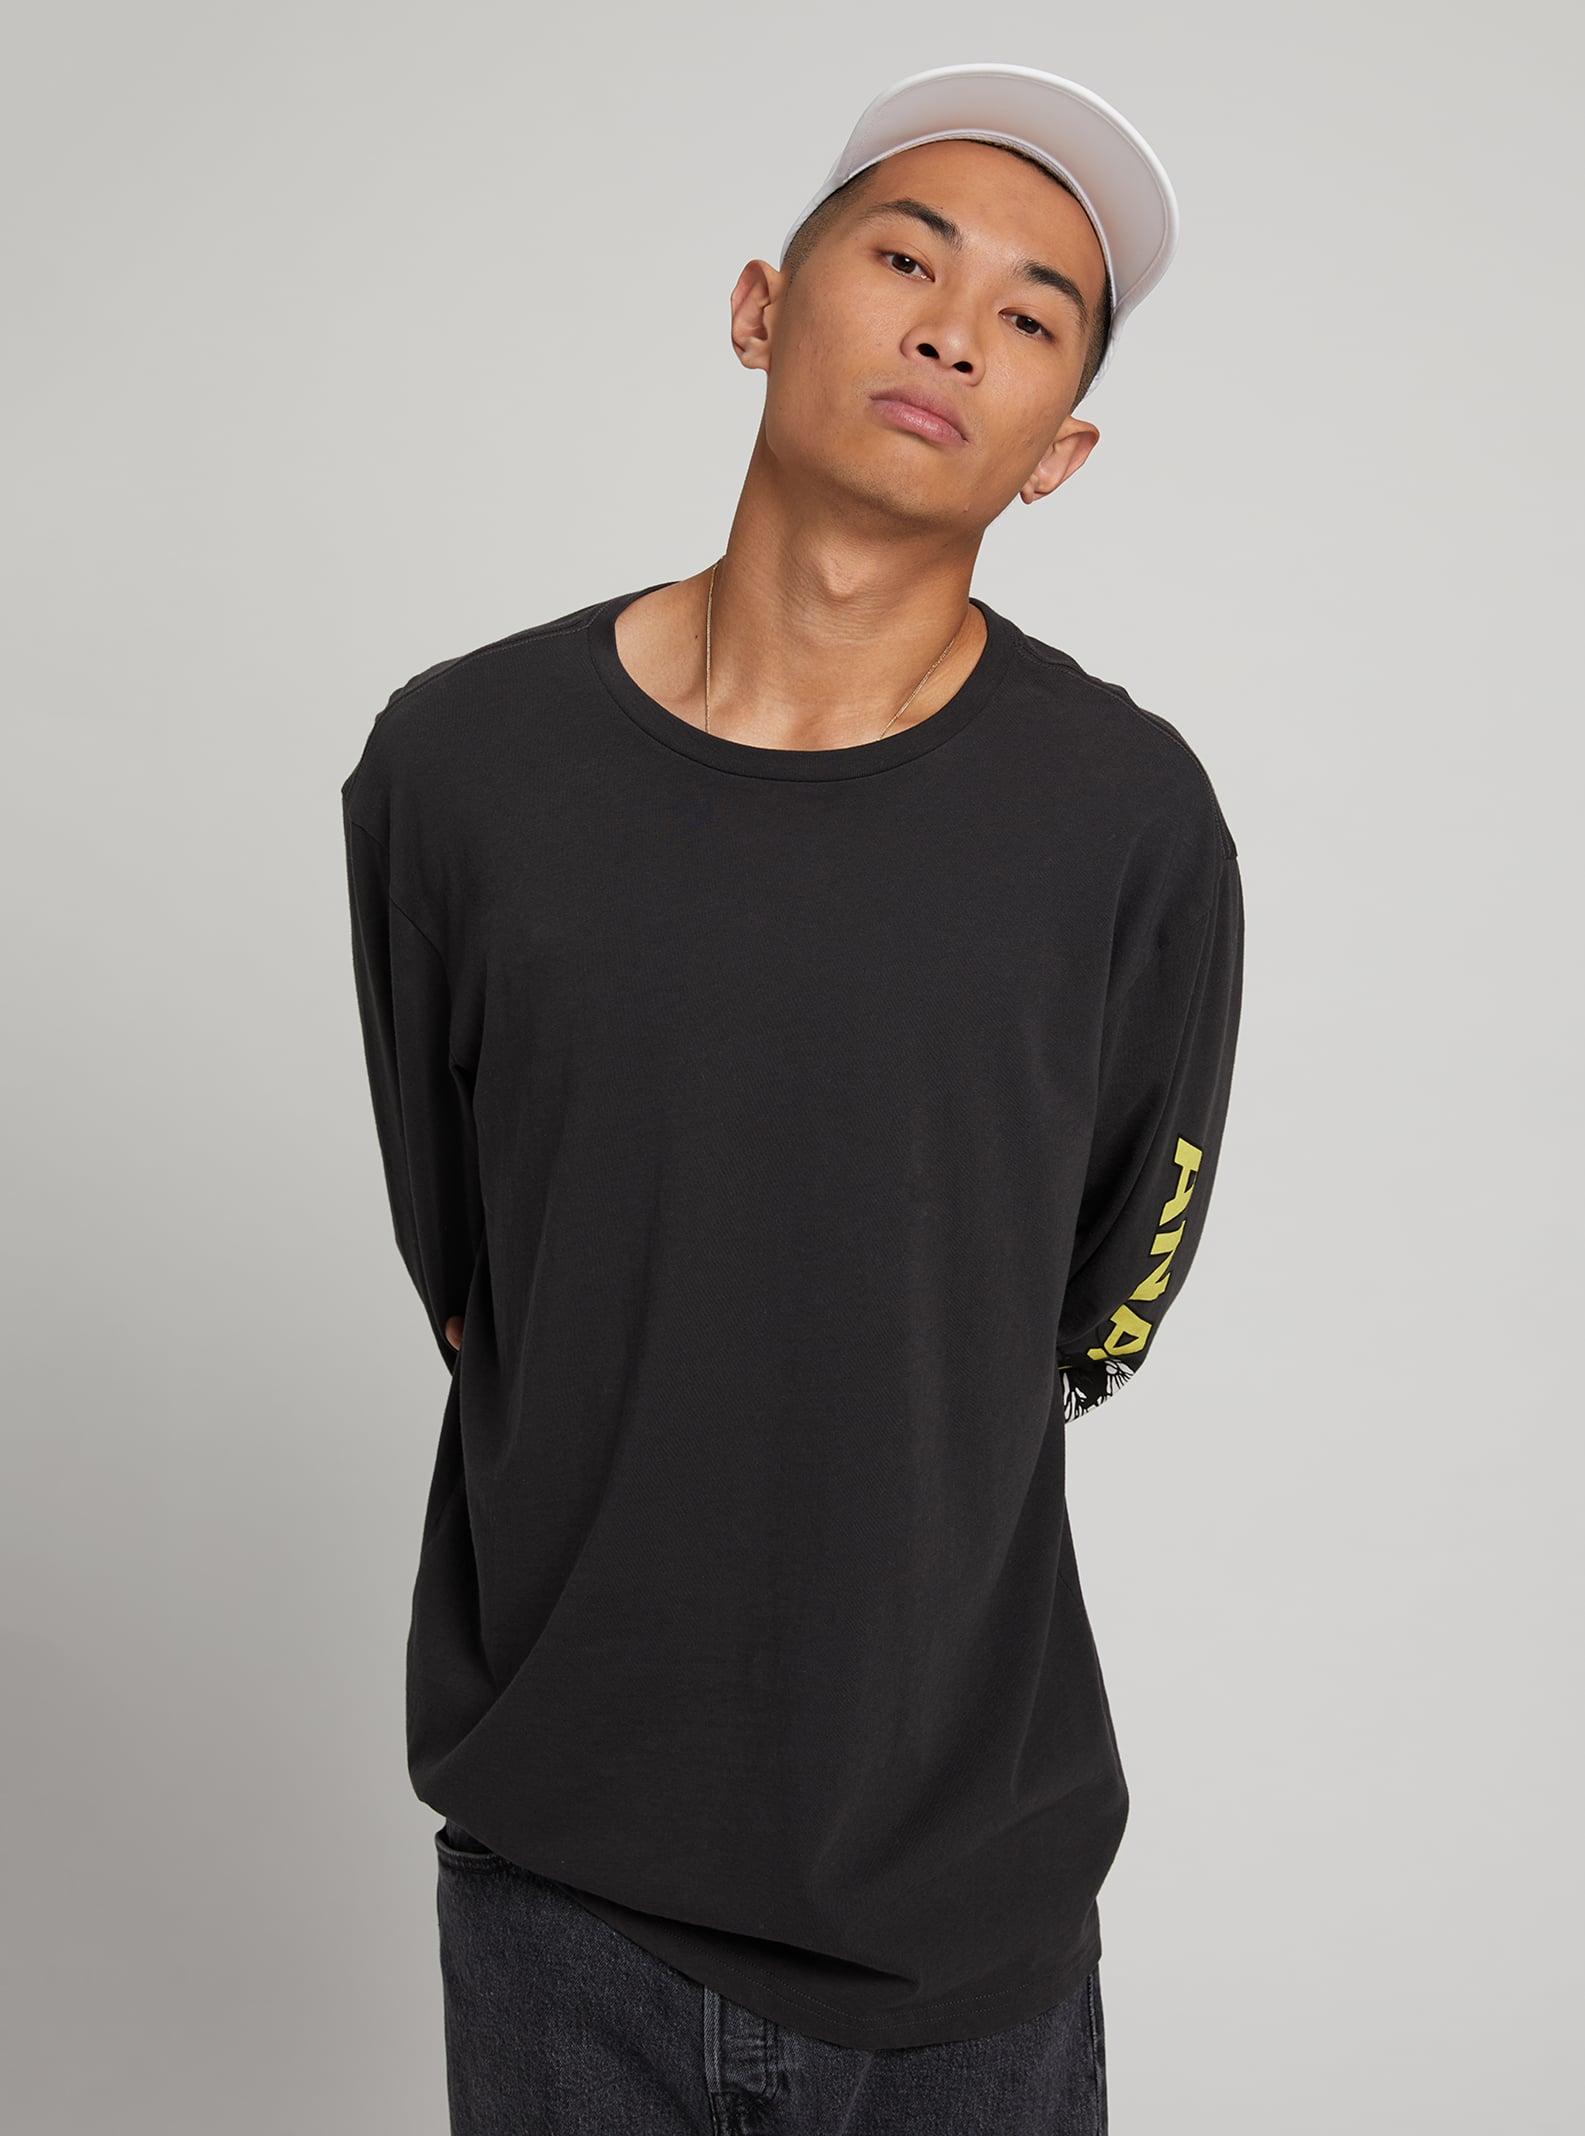 Burton Analog Blackthorne långärmad t-shirt, S